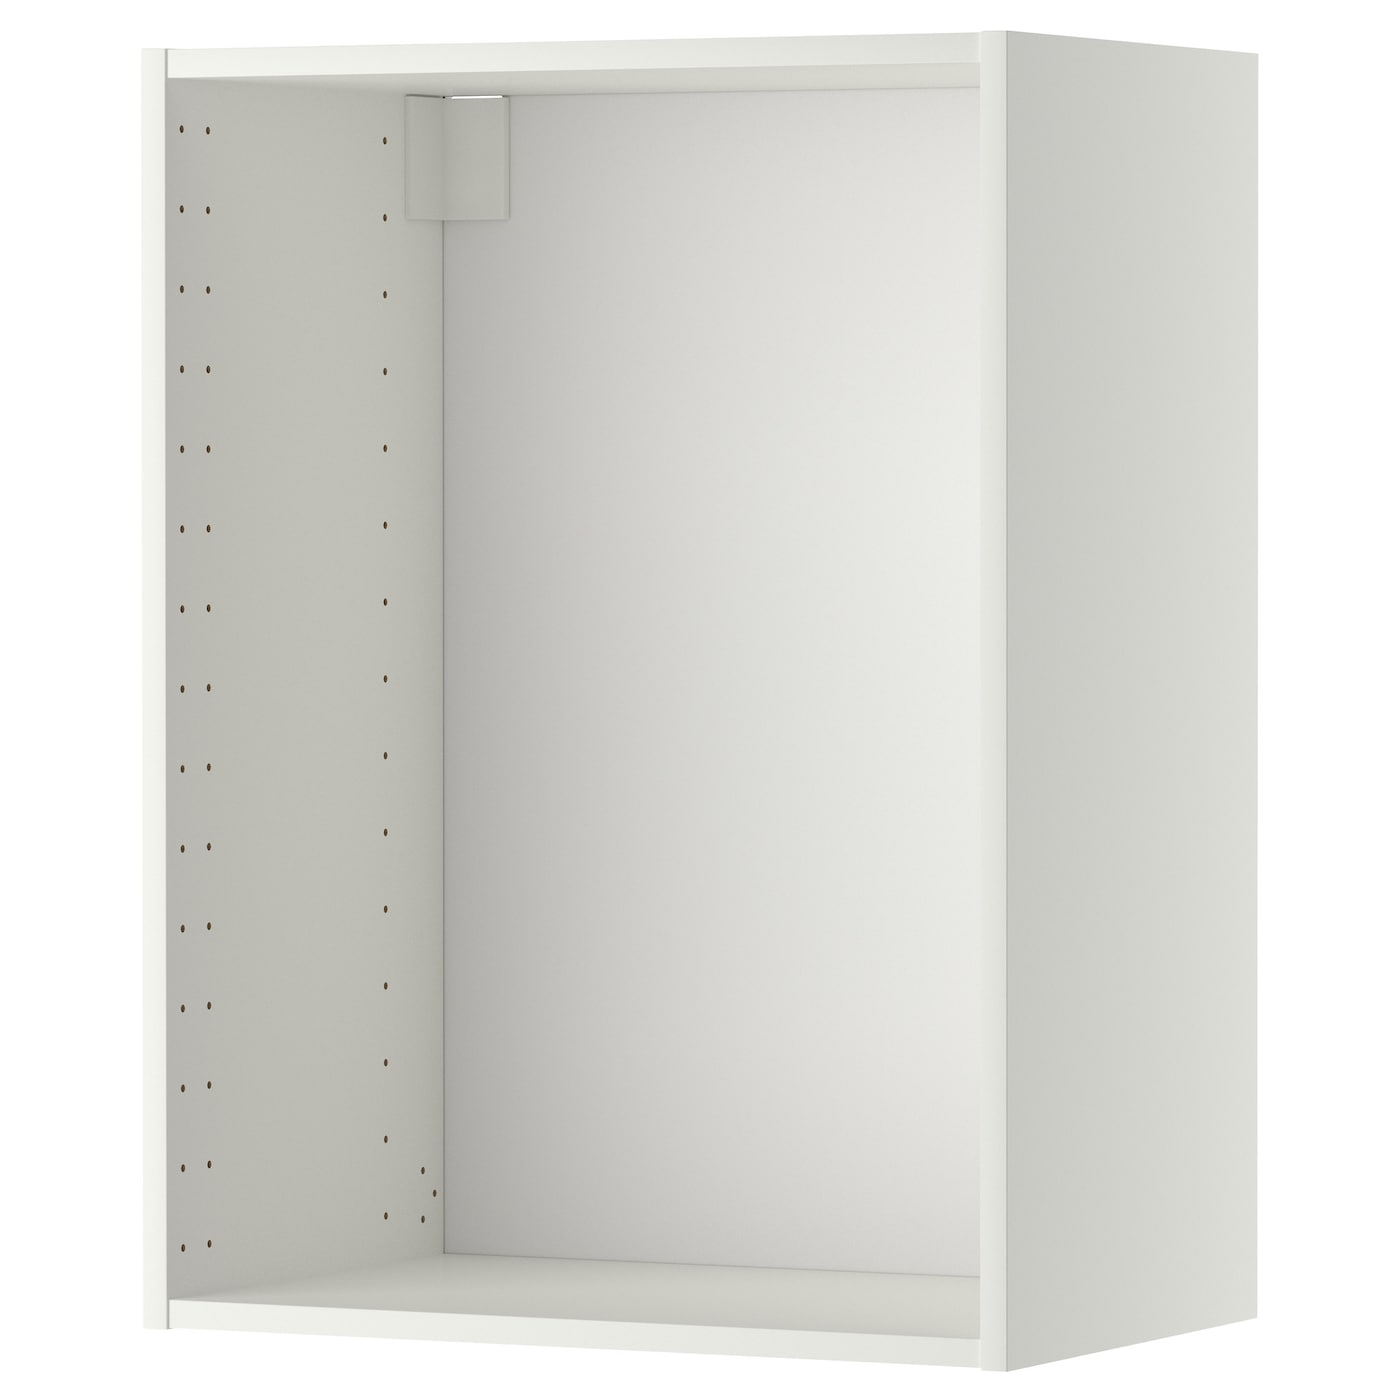 METOD Oberschrank - weiß - IKEA